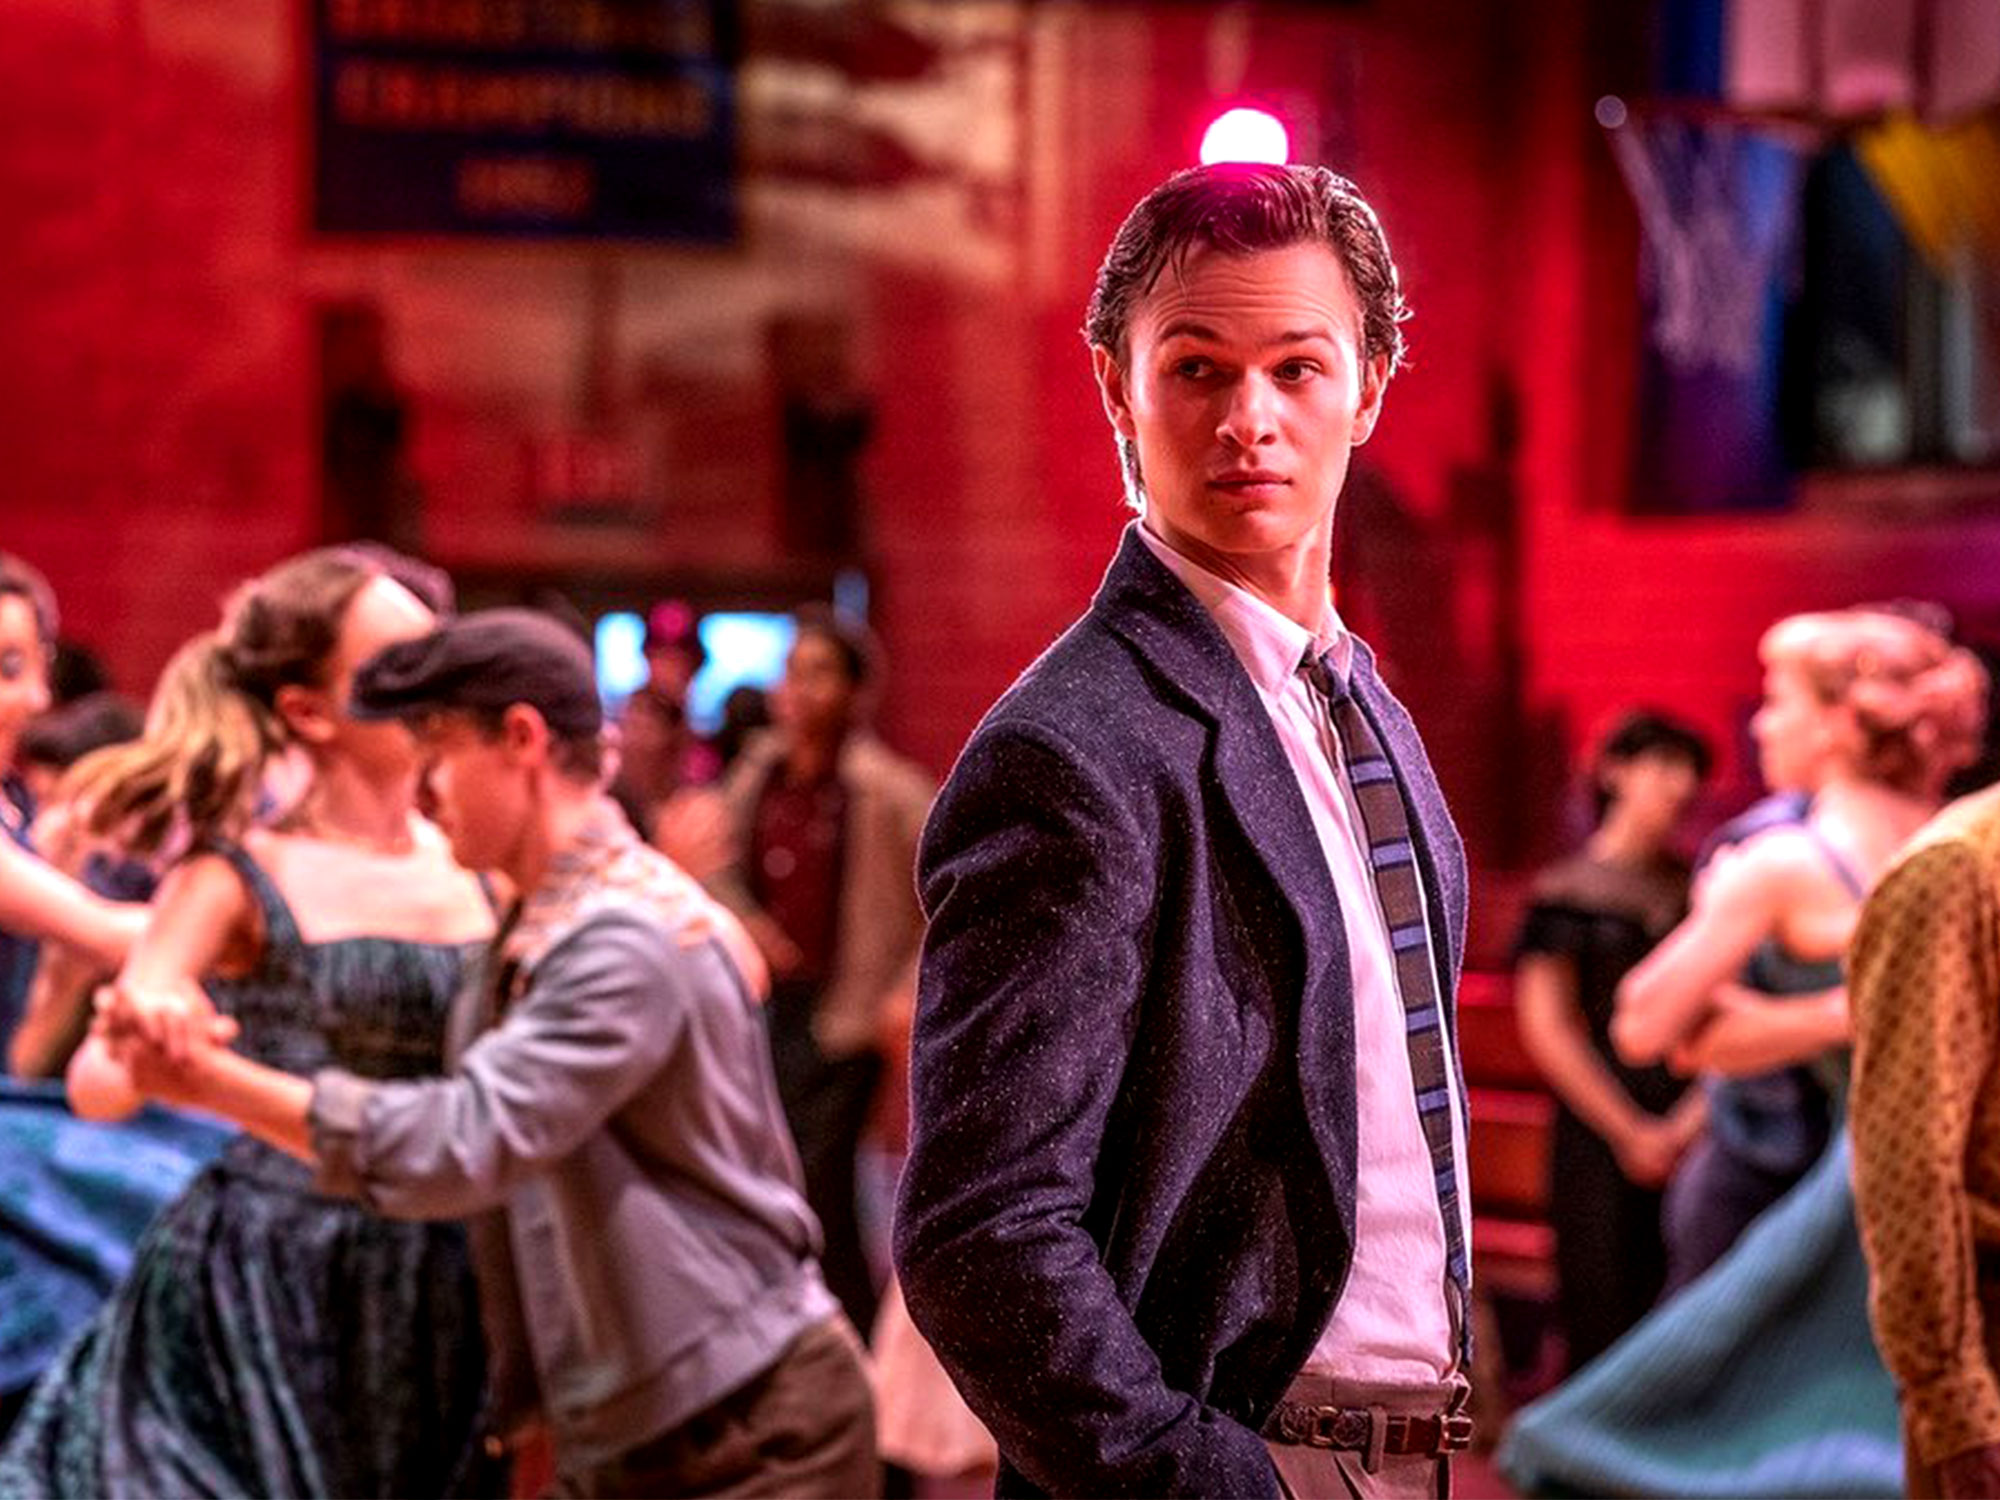 Ansel Elgort in West Side Story (2020)